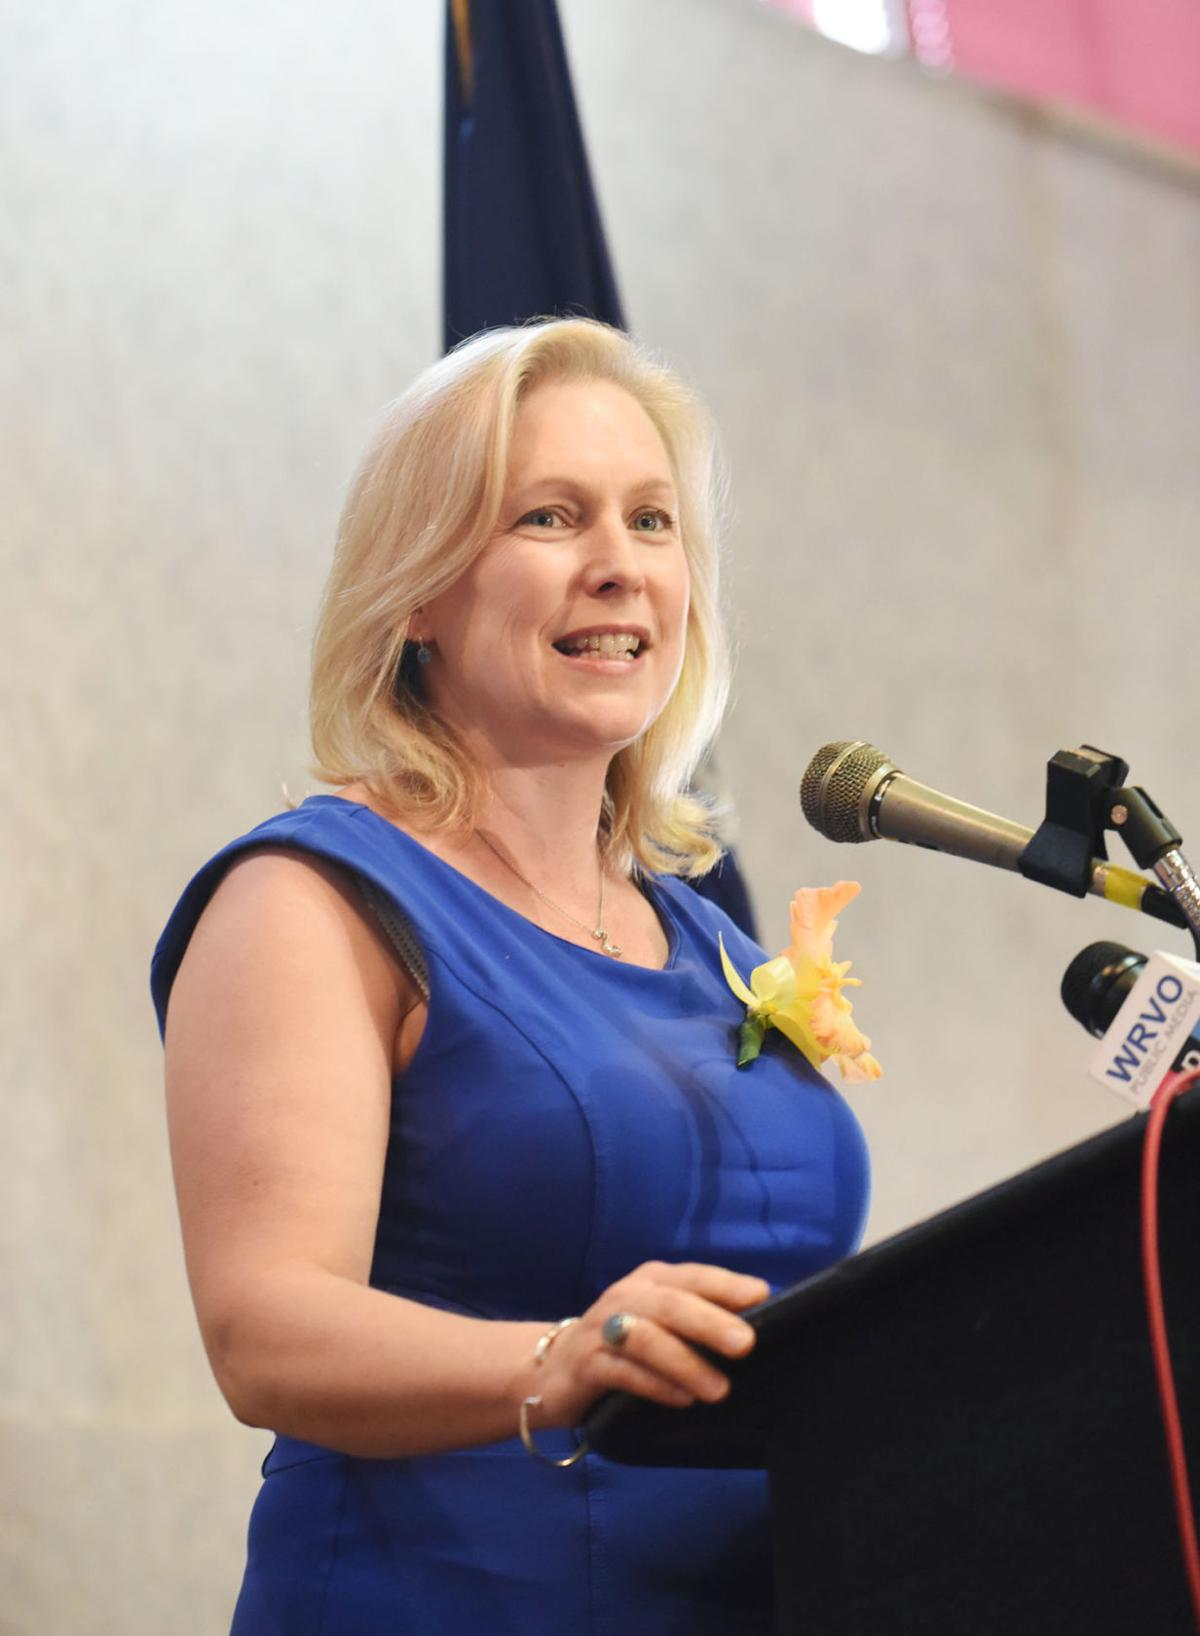 Gillibrand nominates cayuga county area students to attend for Auburnpub